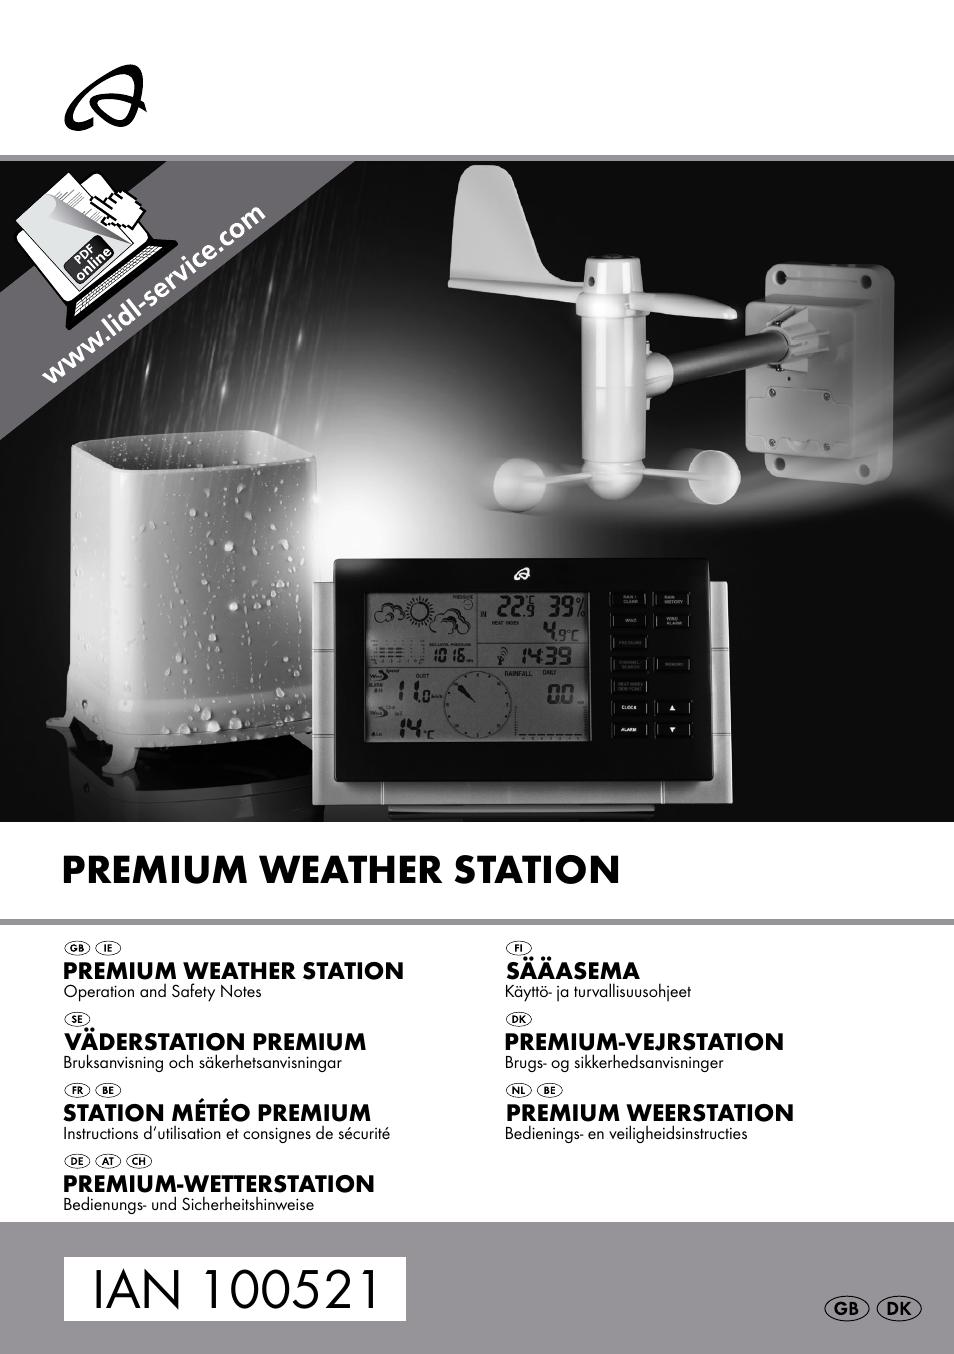 Auriol weather station h13726 manual transfer